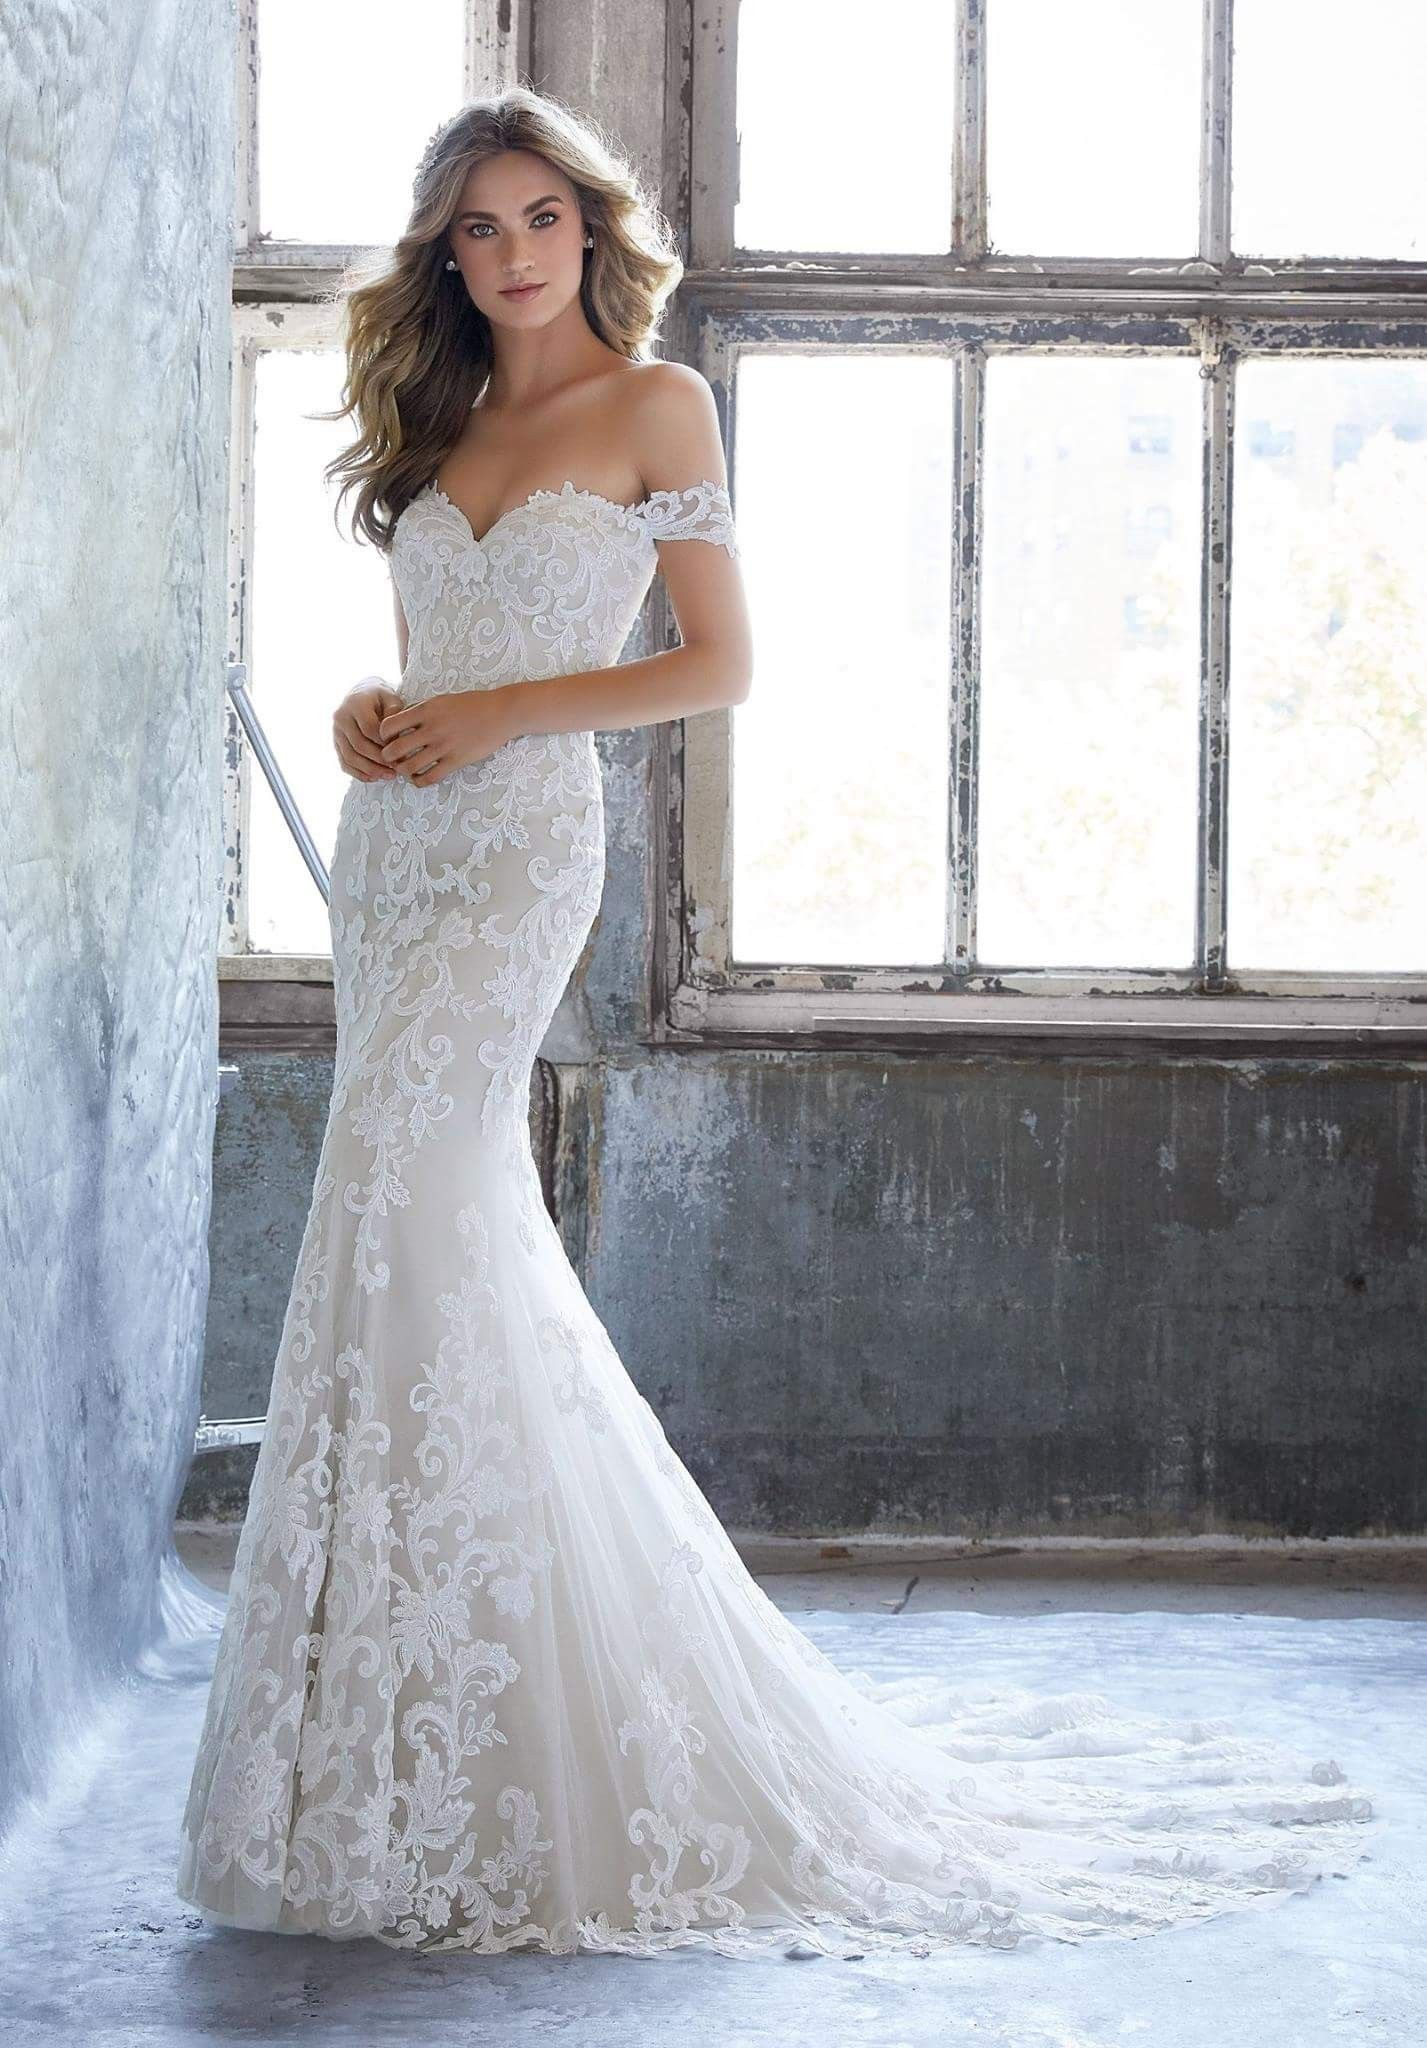 Mori lee madeline gardner wedding dress  Morilee by Madeline Gardner wedding dress  Wedding  Pinterest